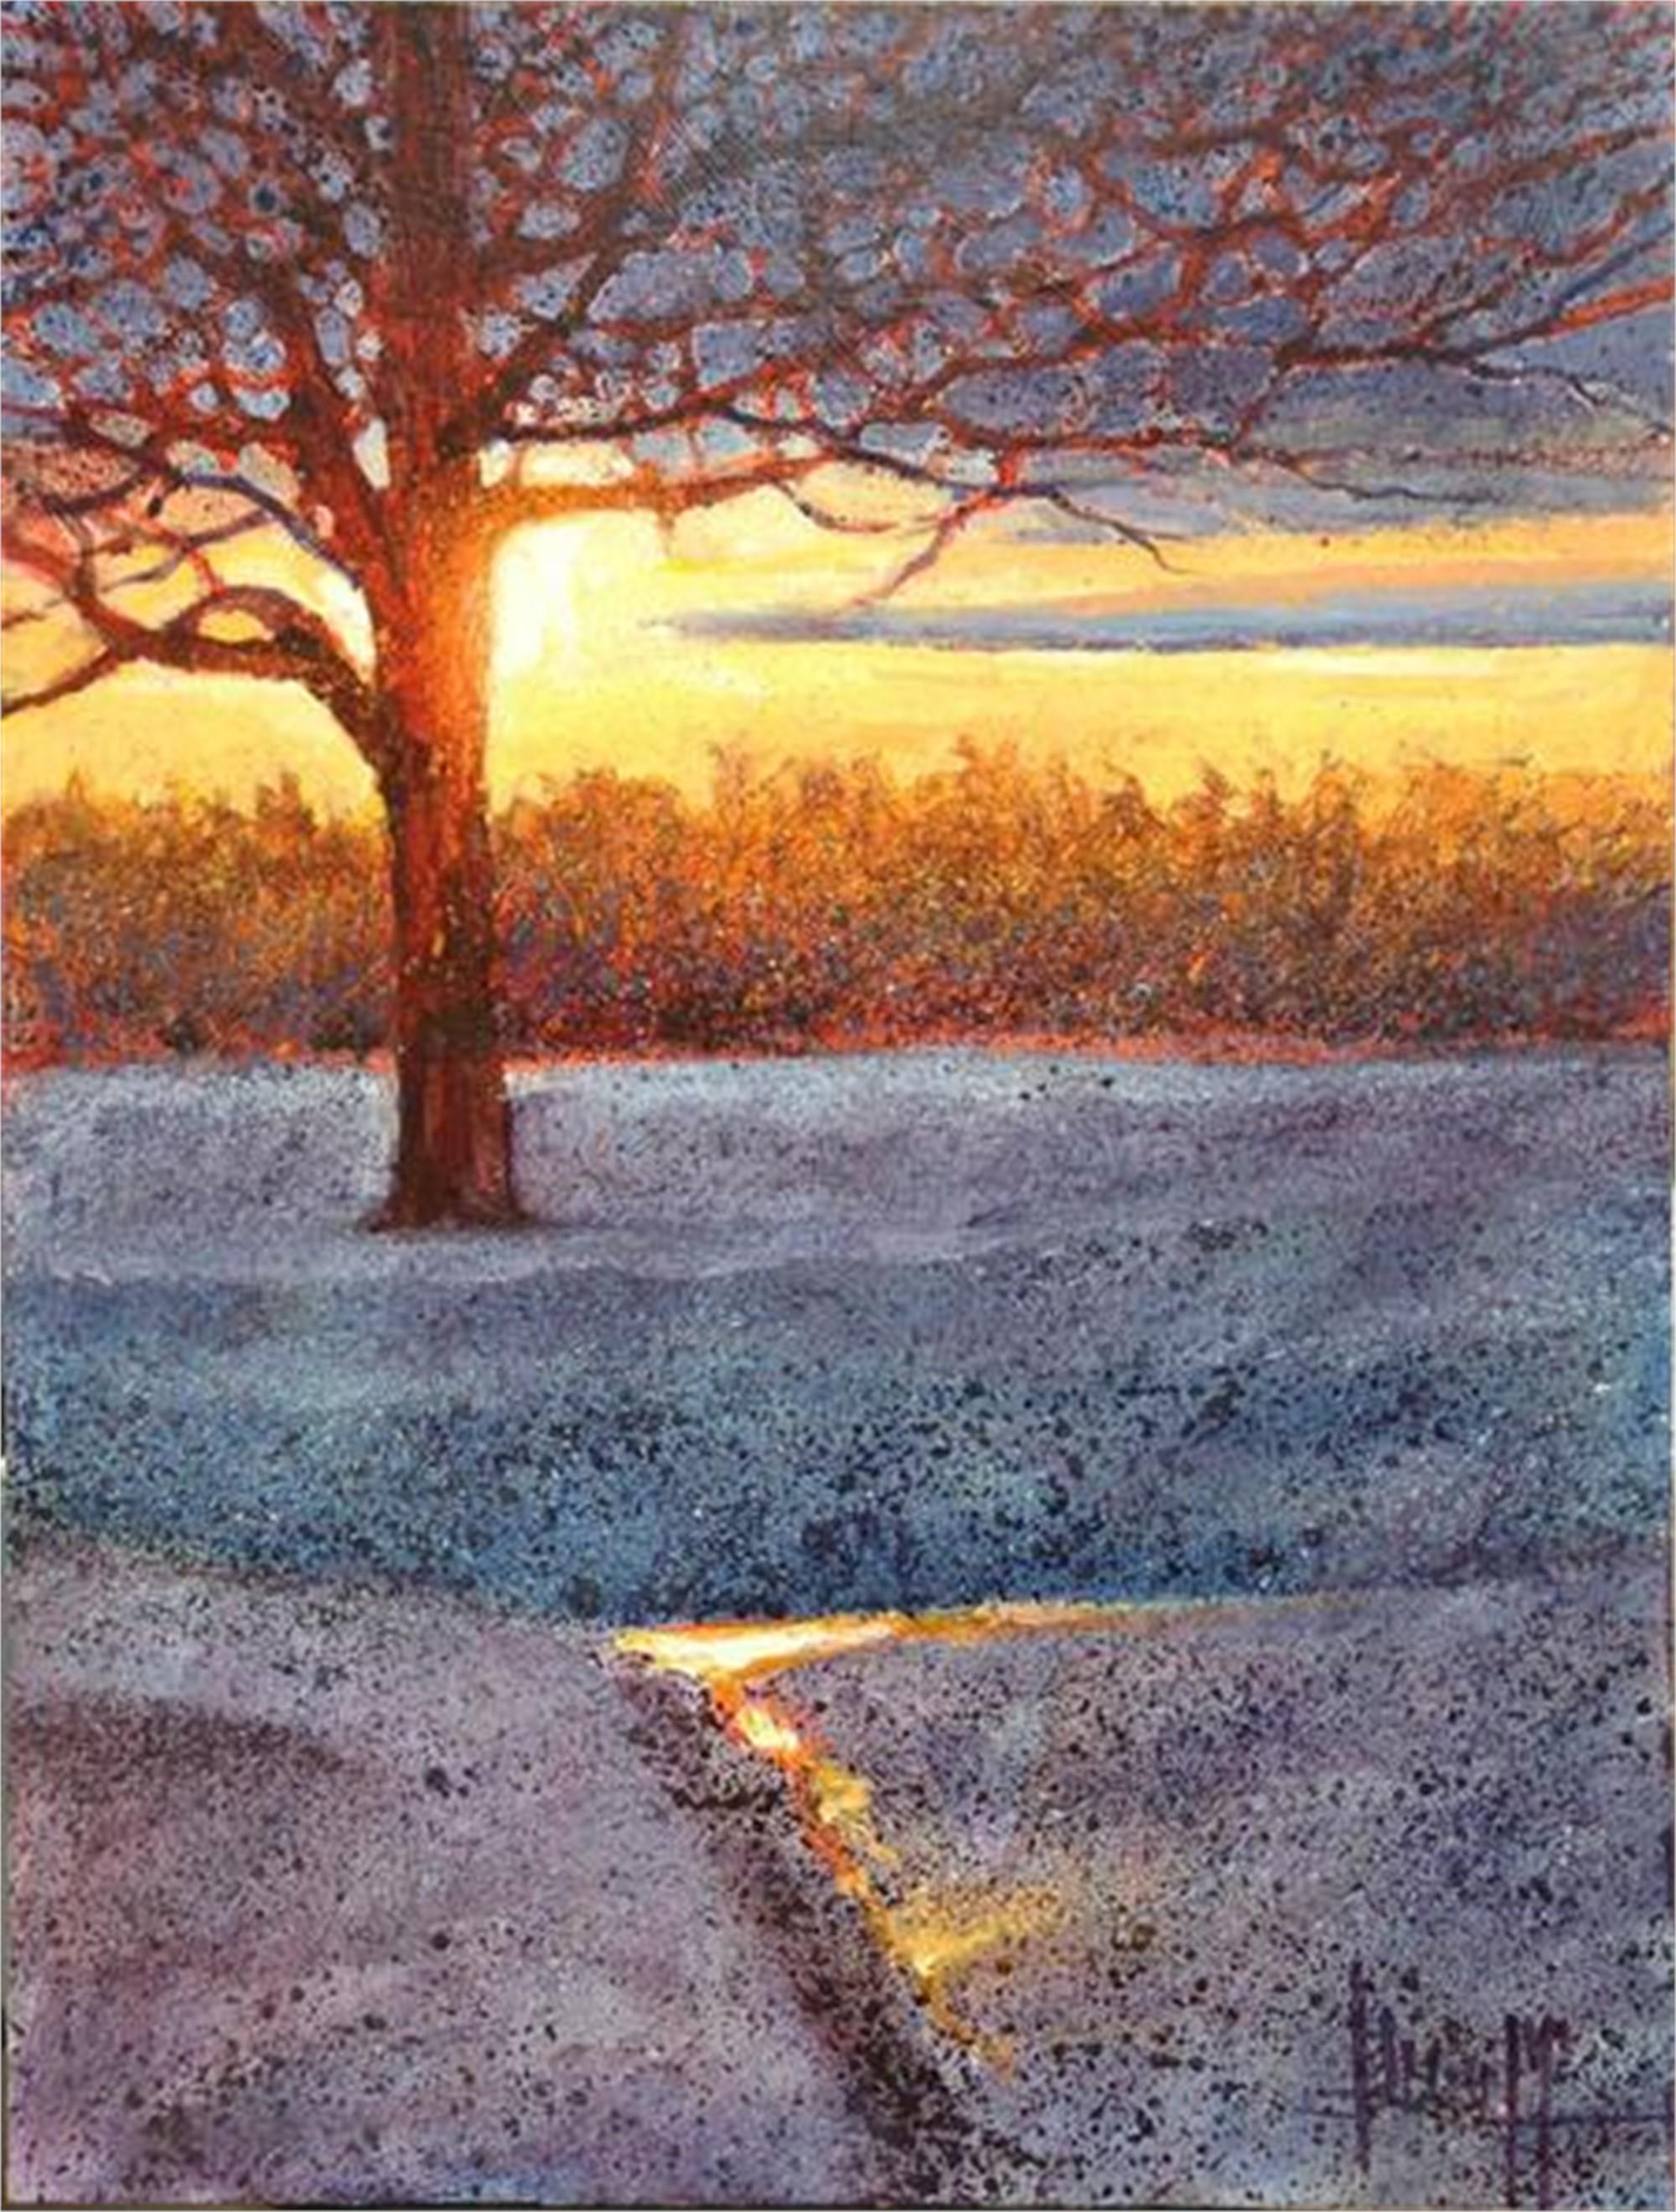 Star City Sunset by Judy Greff